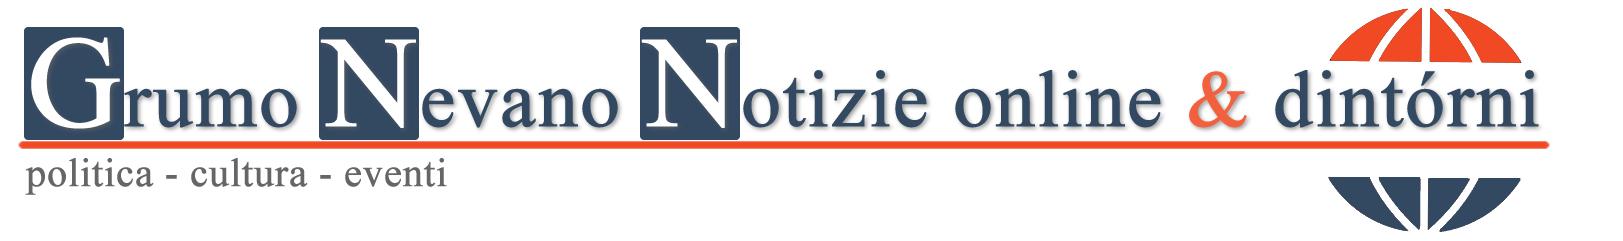 Grumo Nevano Notizie online & dintorni